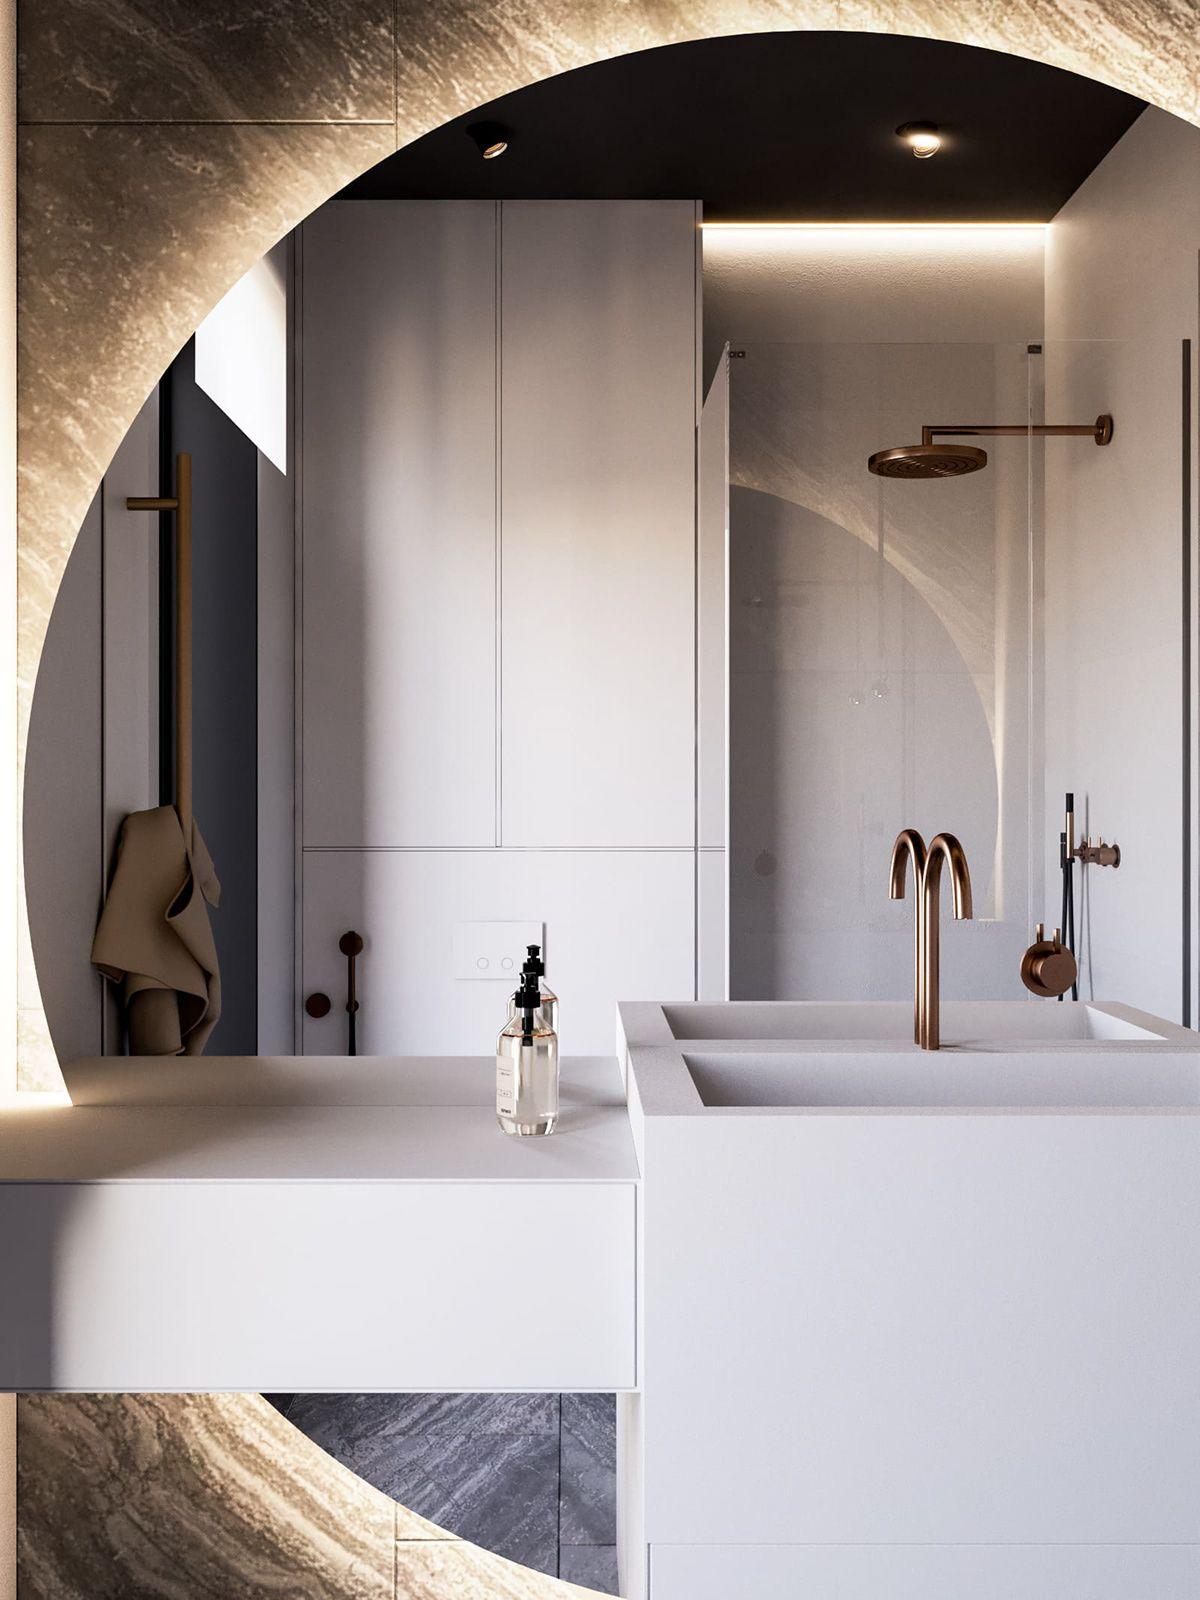 Greige On Behance Bathroom Design Tool Bathroom Decor Bathroom Interior Design Bathroom renovation design tool